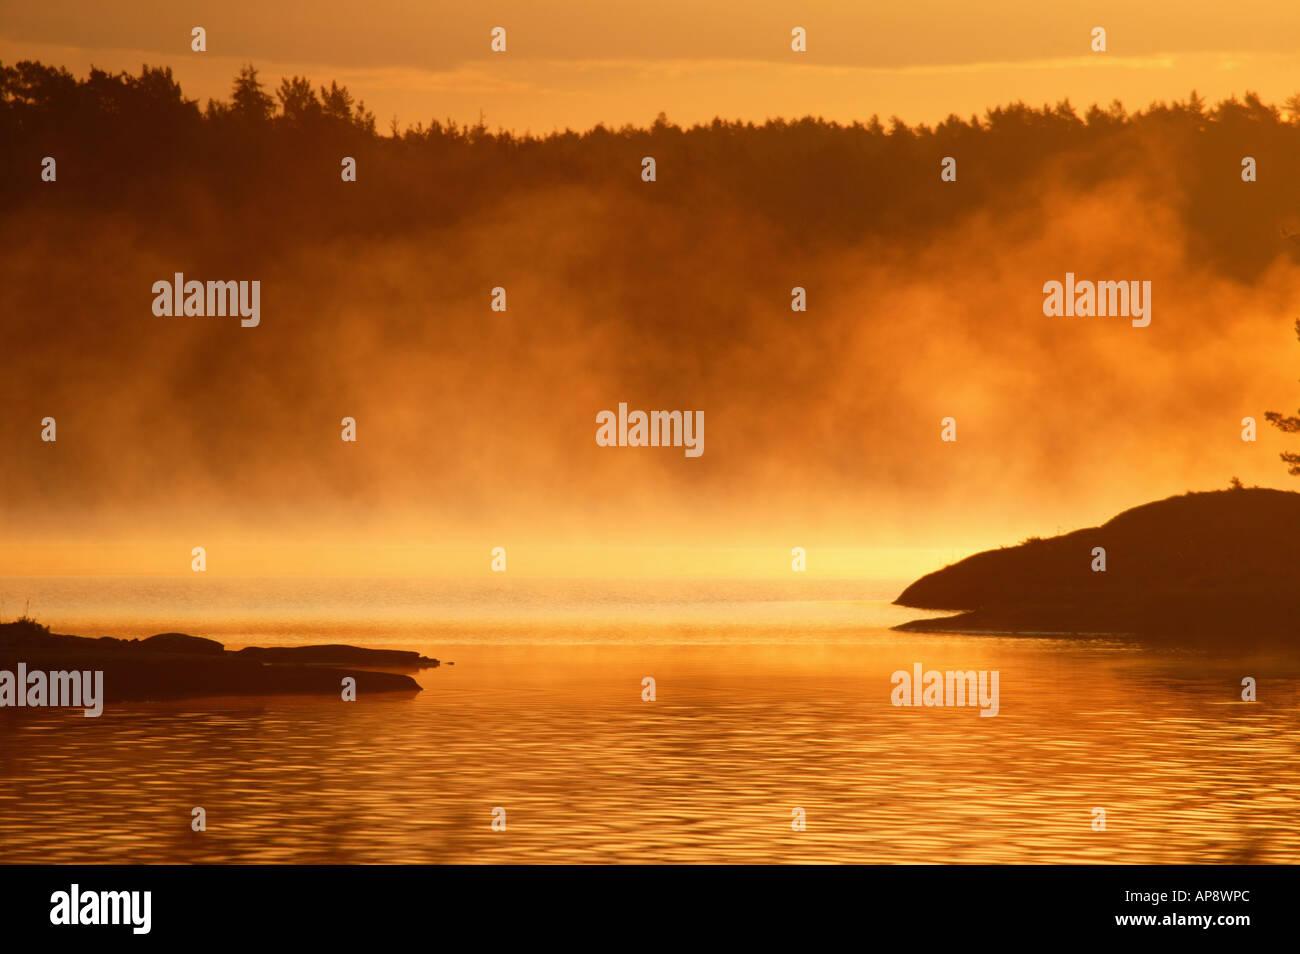 Am frühen Morgen Nebel über dem See Vansjø, Råde Kommune, Østfold Fylke, Norwegen. Stockbild